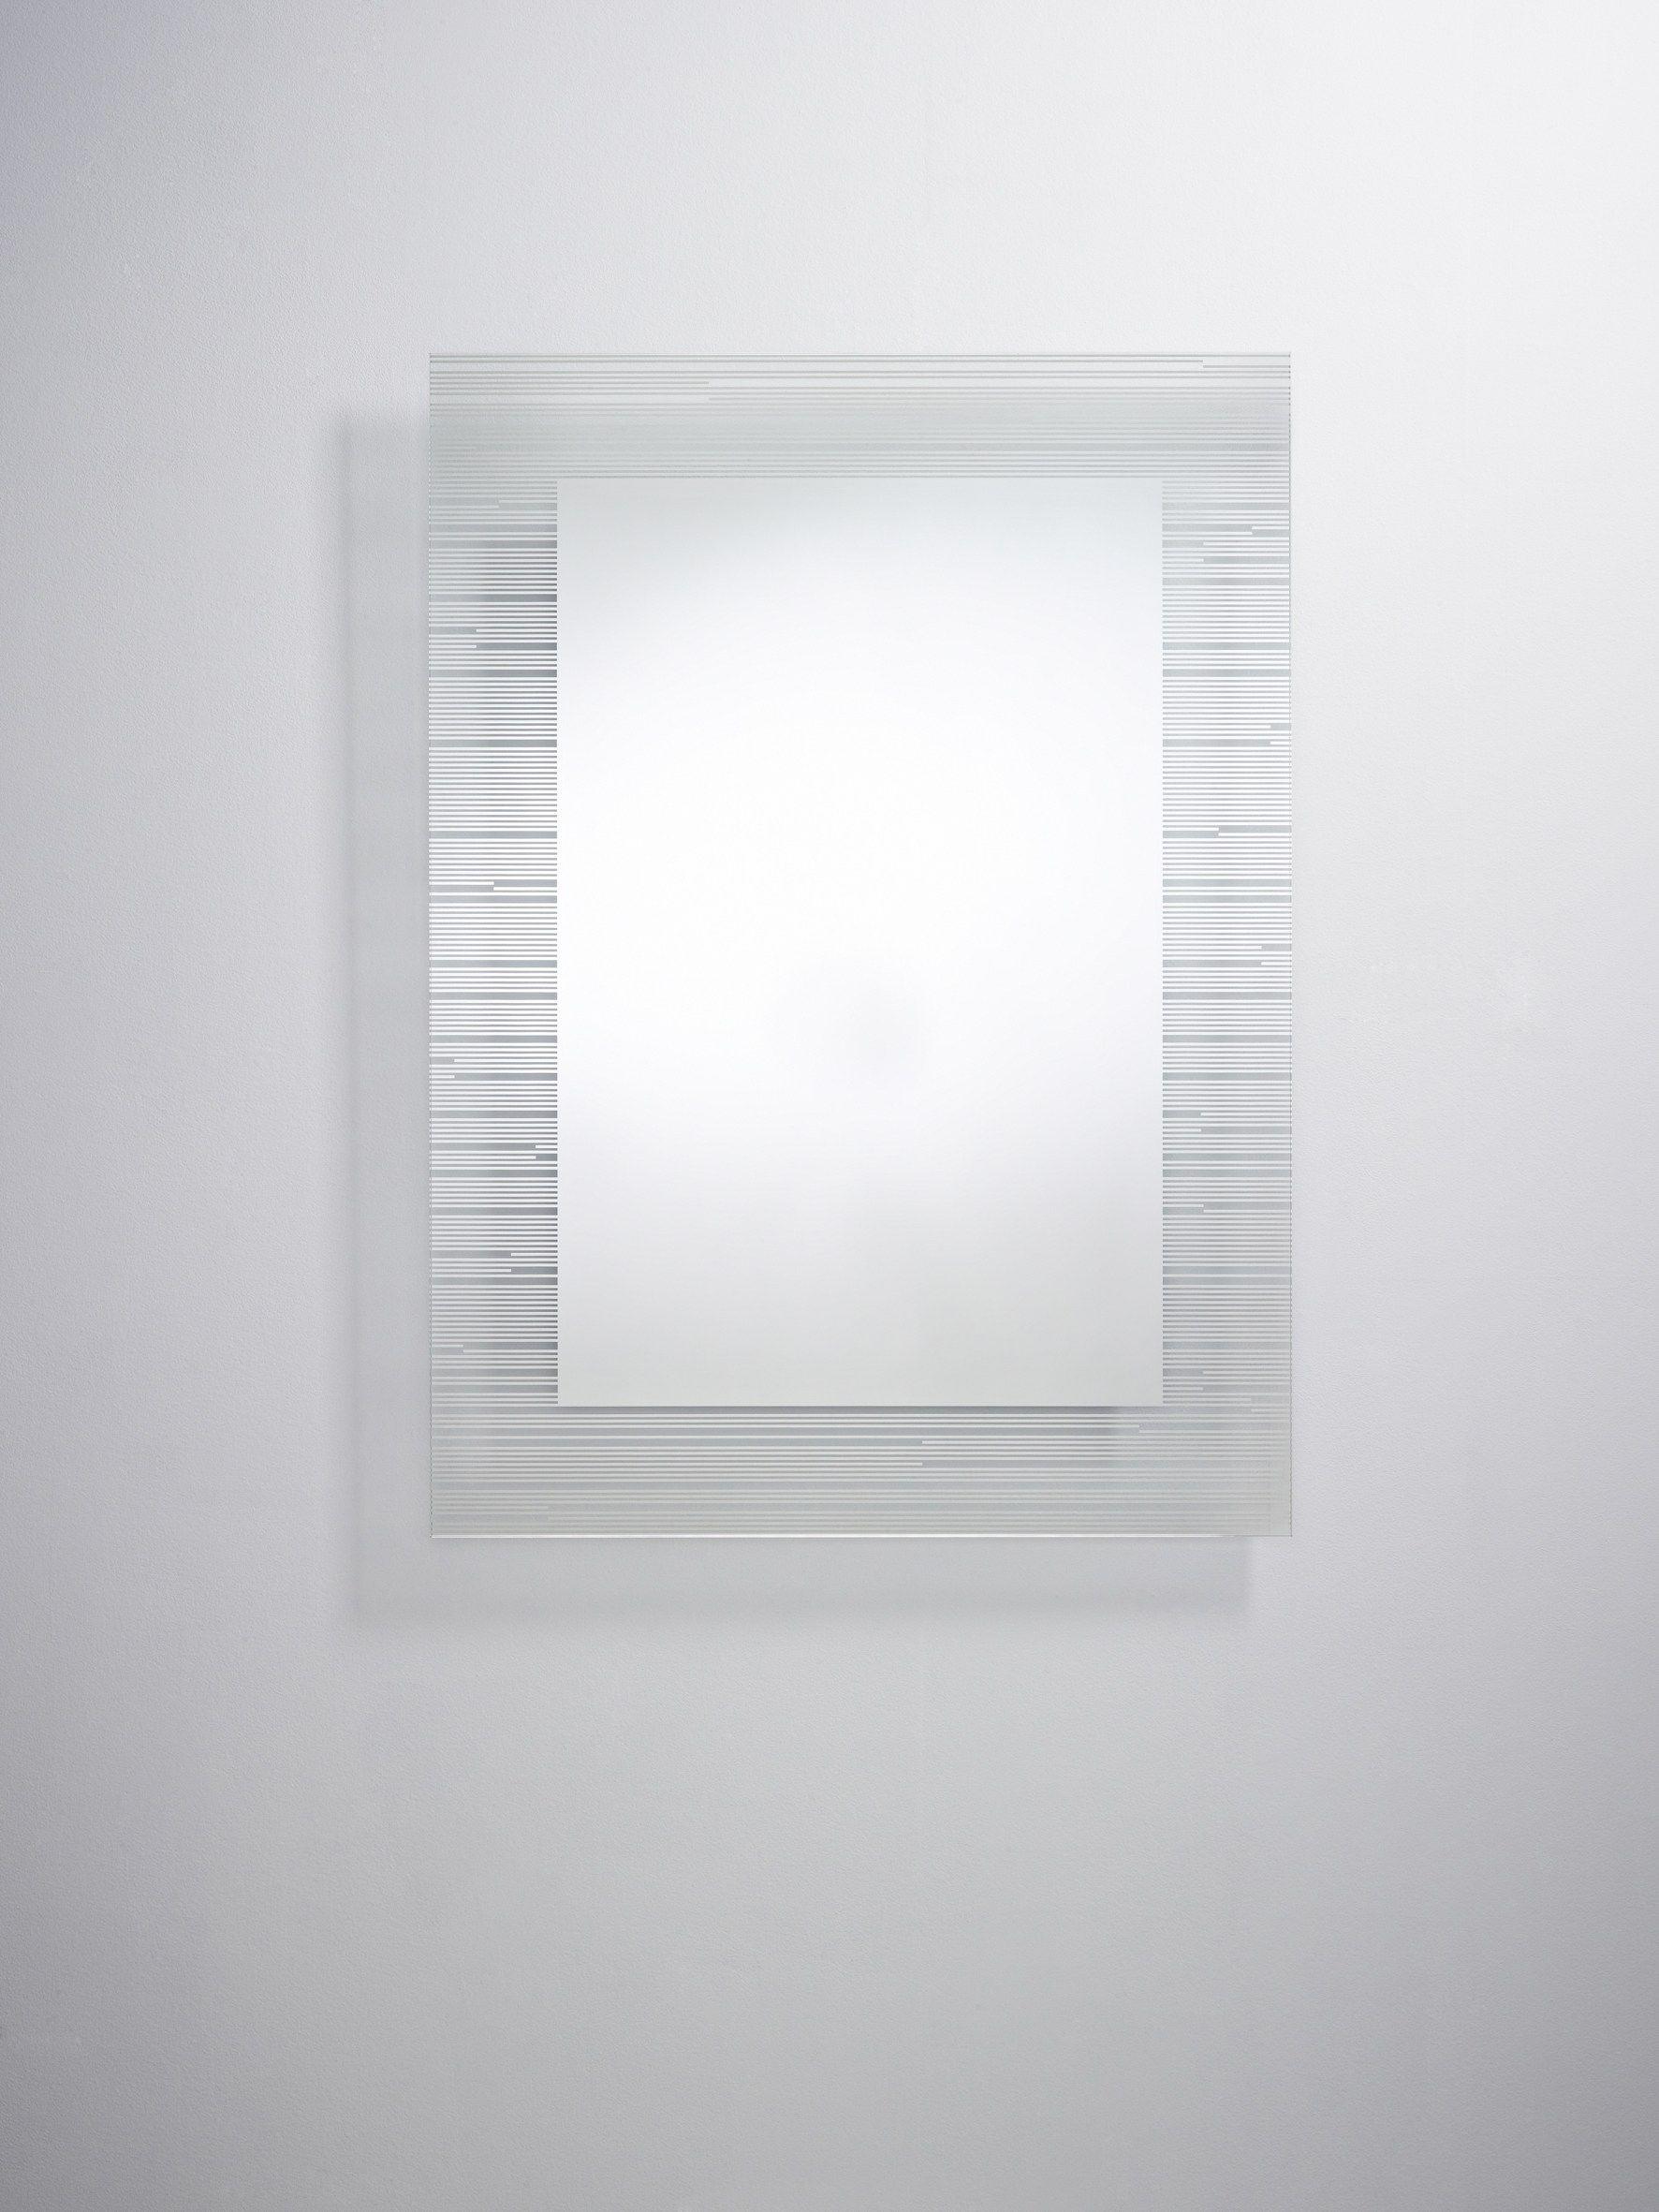 Sonar miroir de style contemporain pour salle de bain by for Colle pour miroir mural